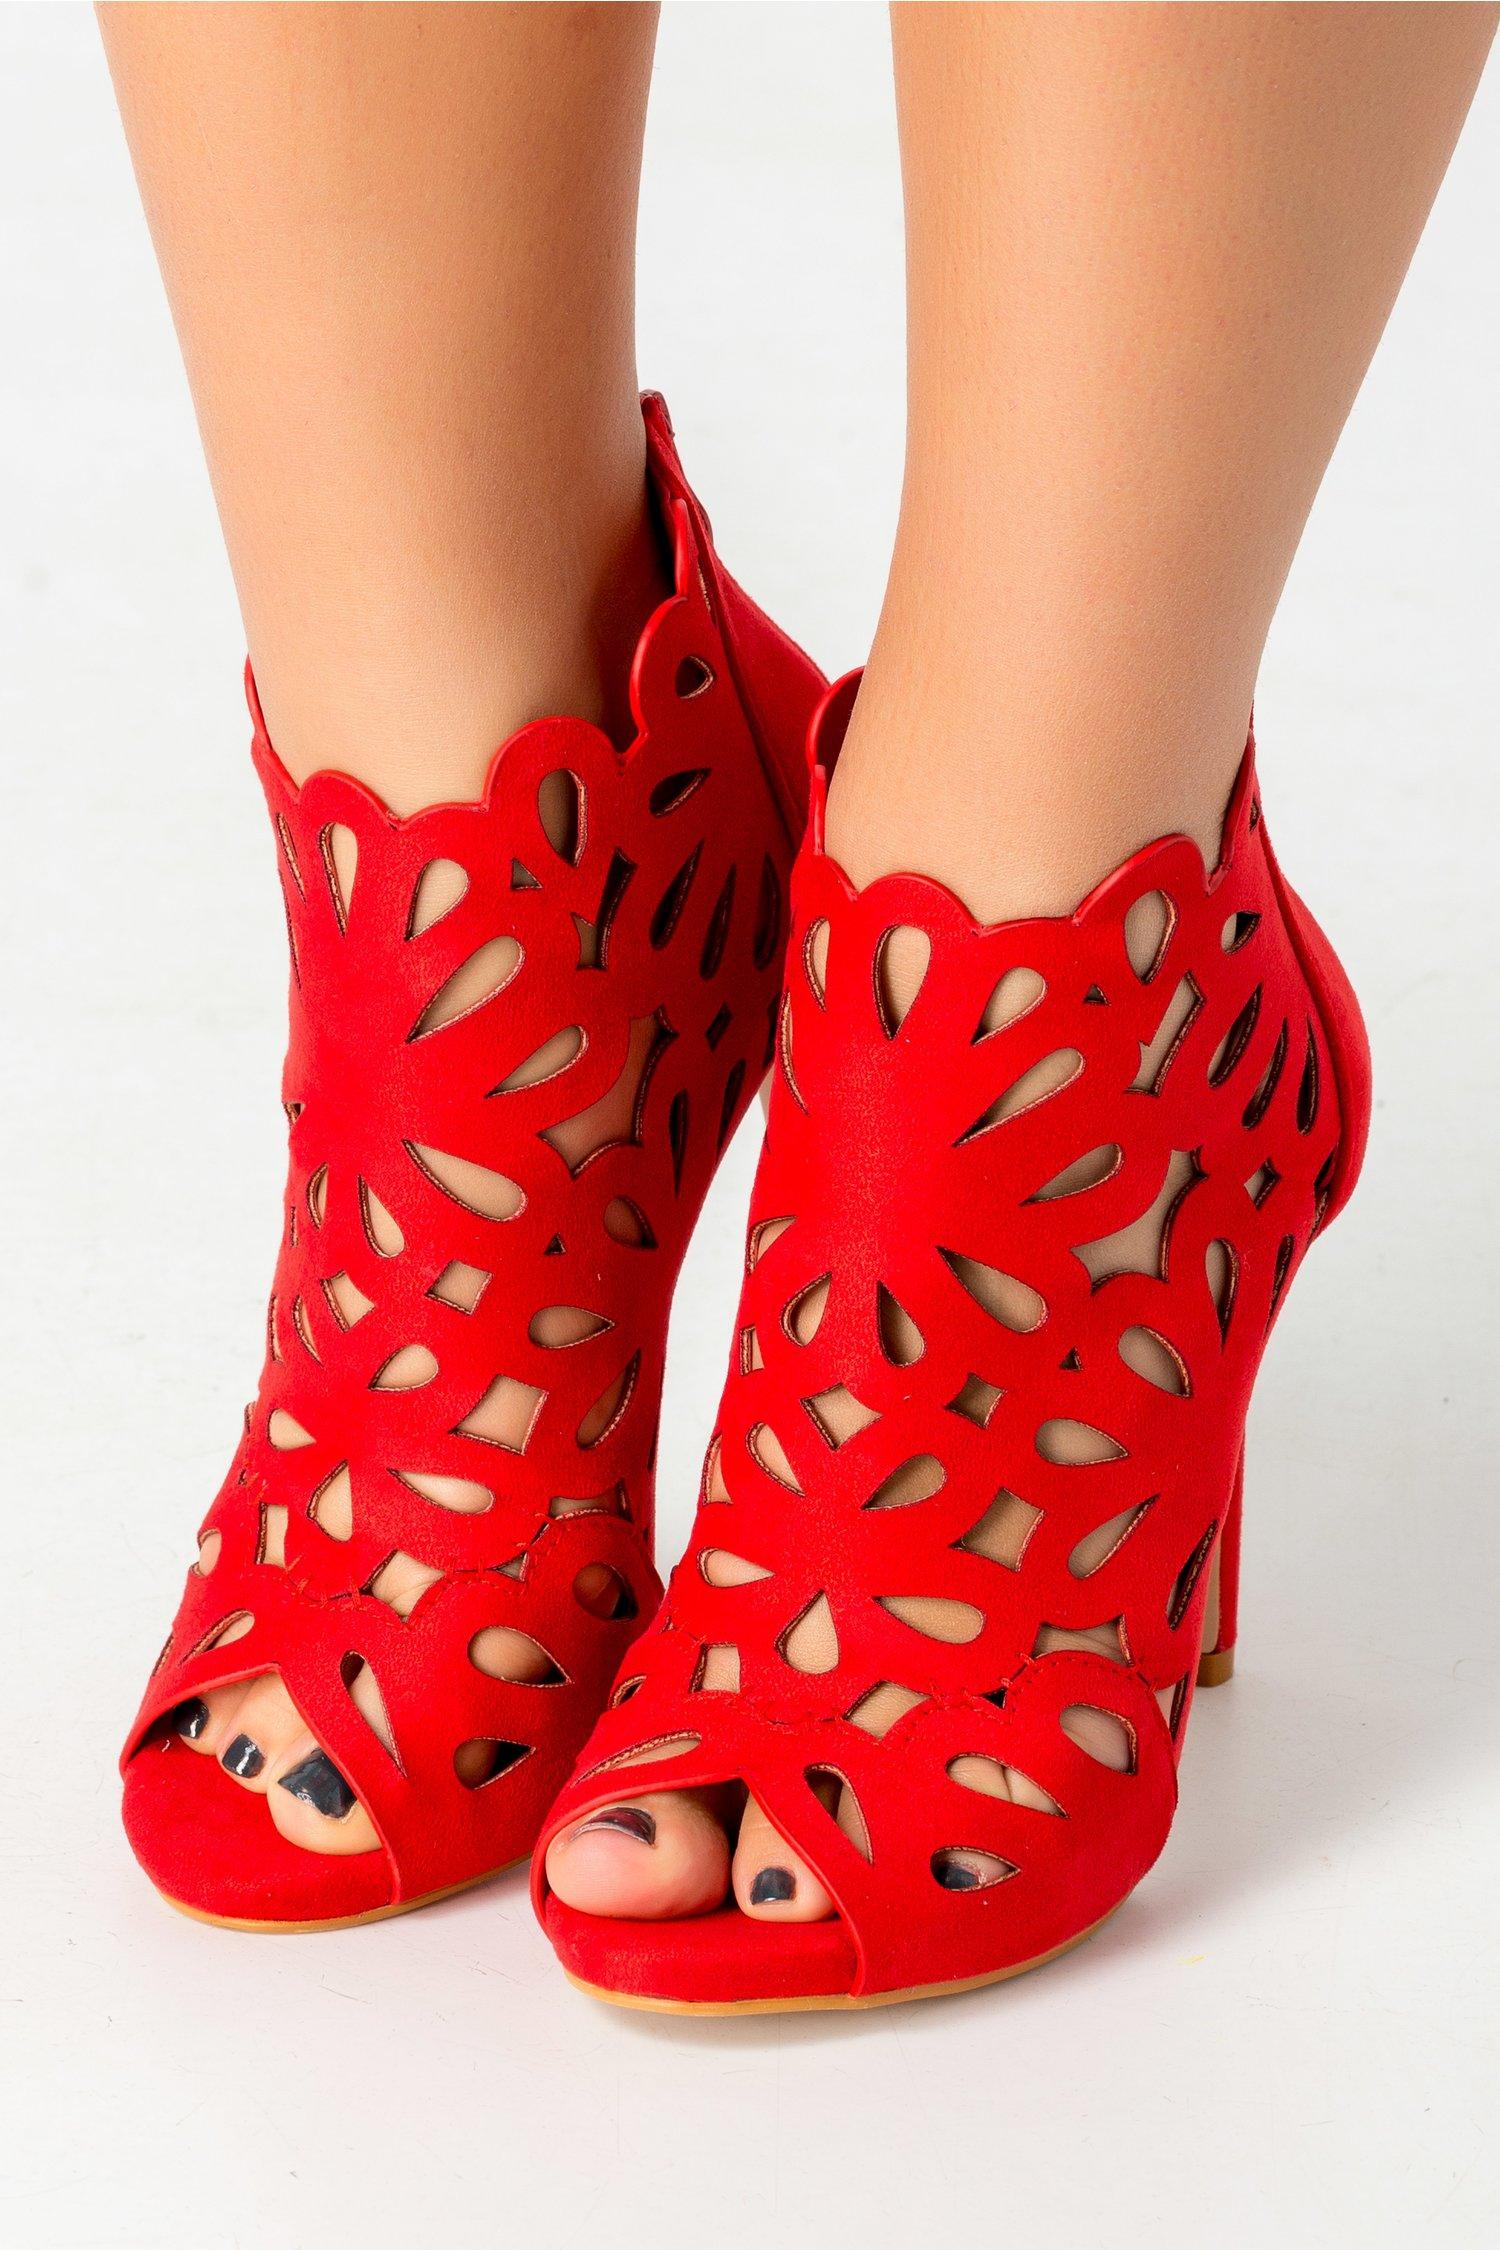 Sandale Bella rosii cu decupaje